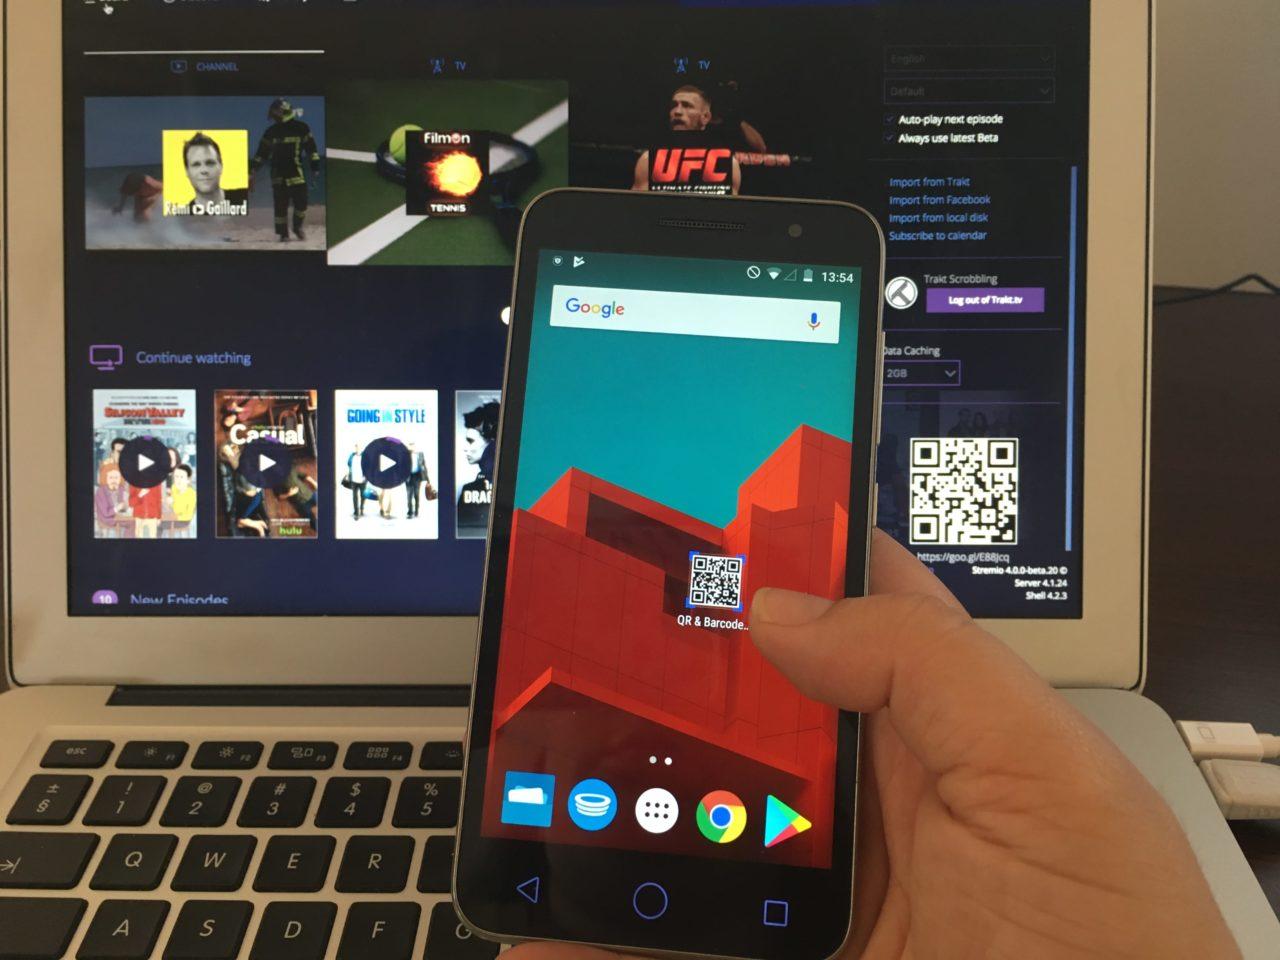 Make your phone a Stremio remote - The Stremio Blog